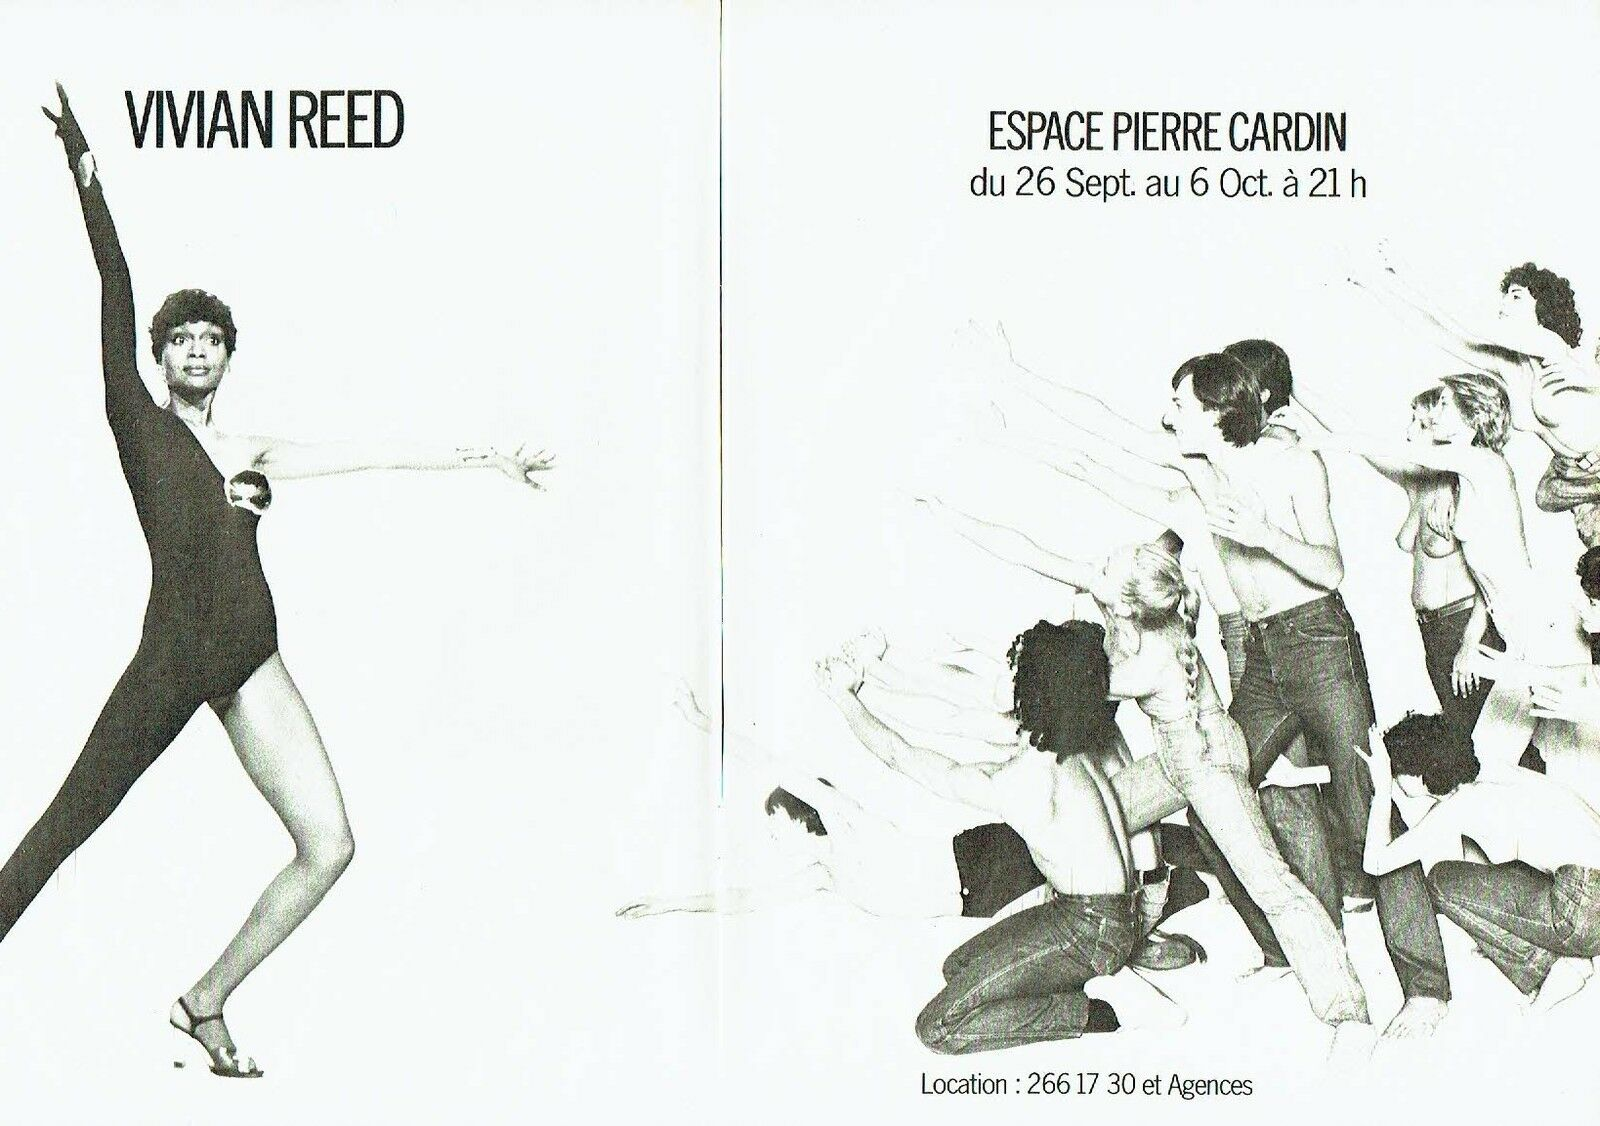 1979 Espace Pierre Cardin Vivian Reed